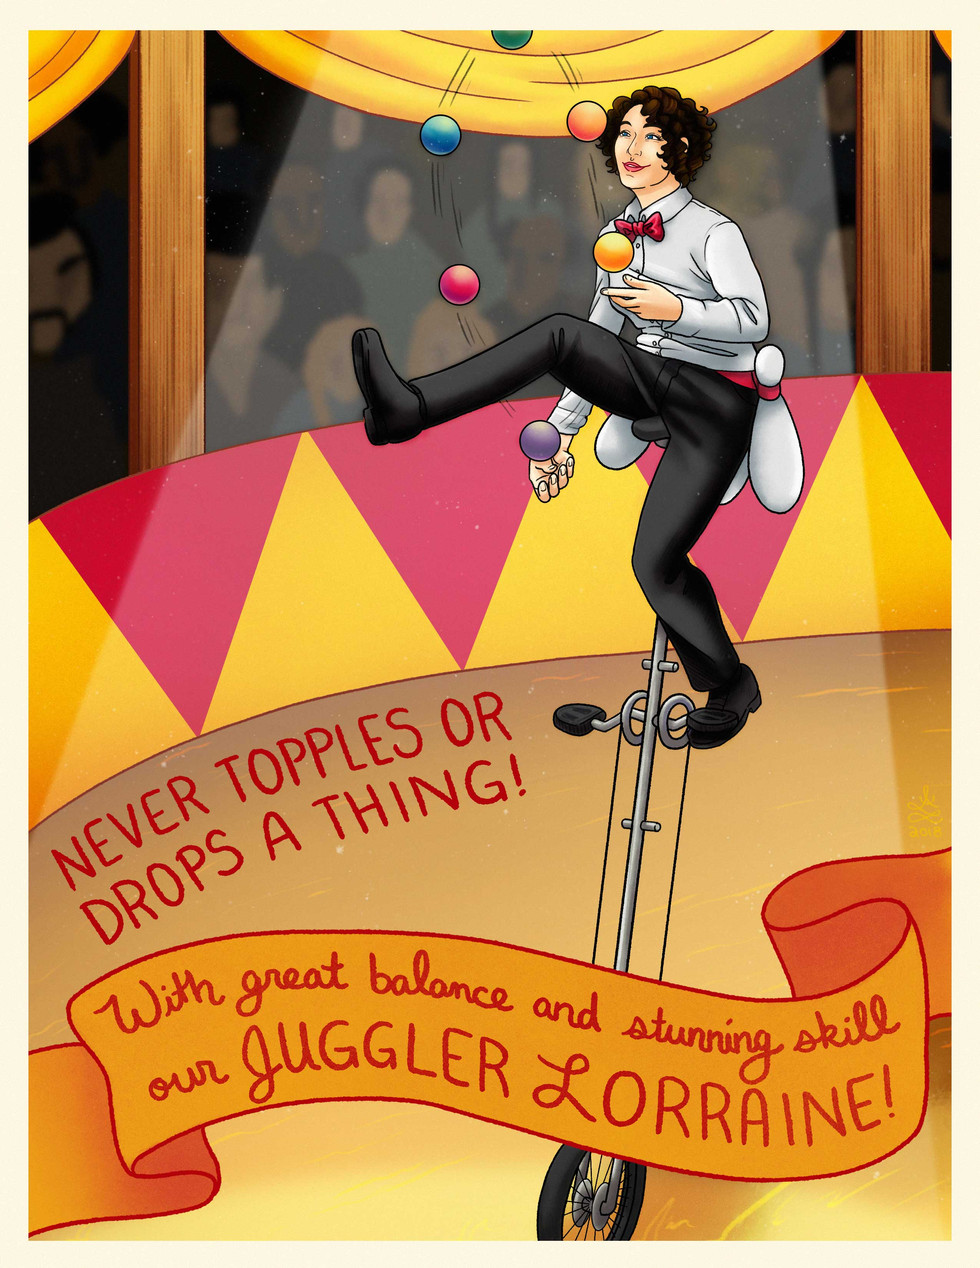 Juggler Lorraine